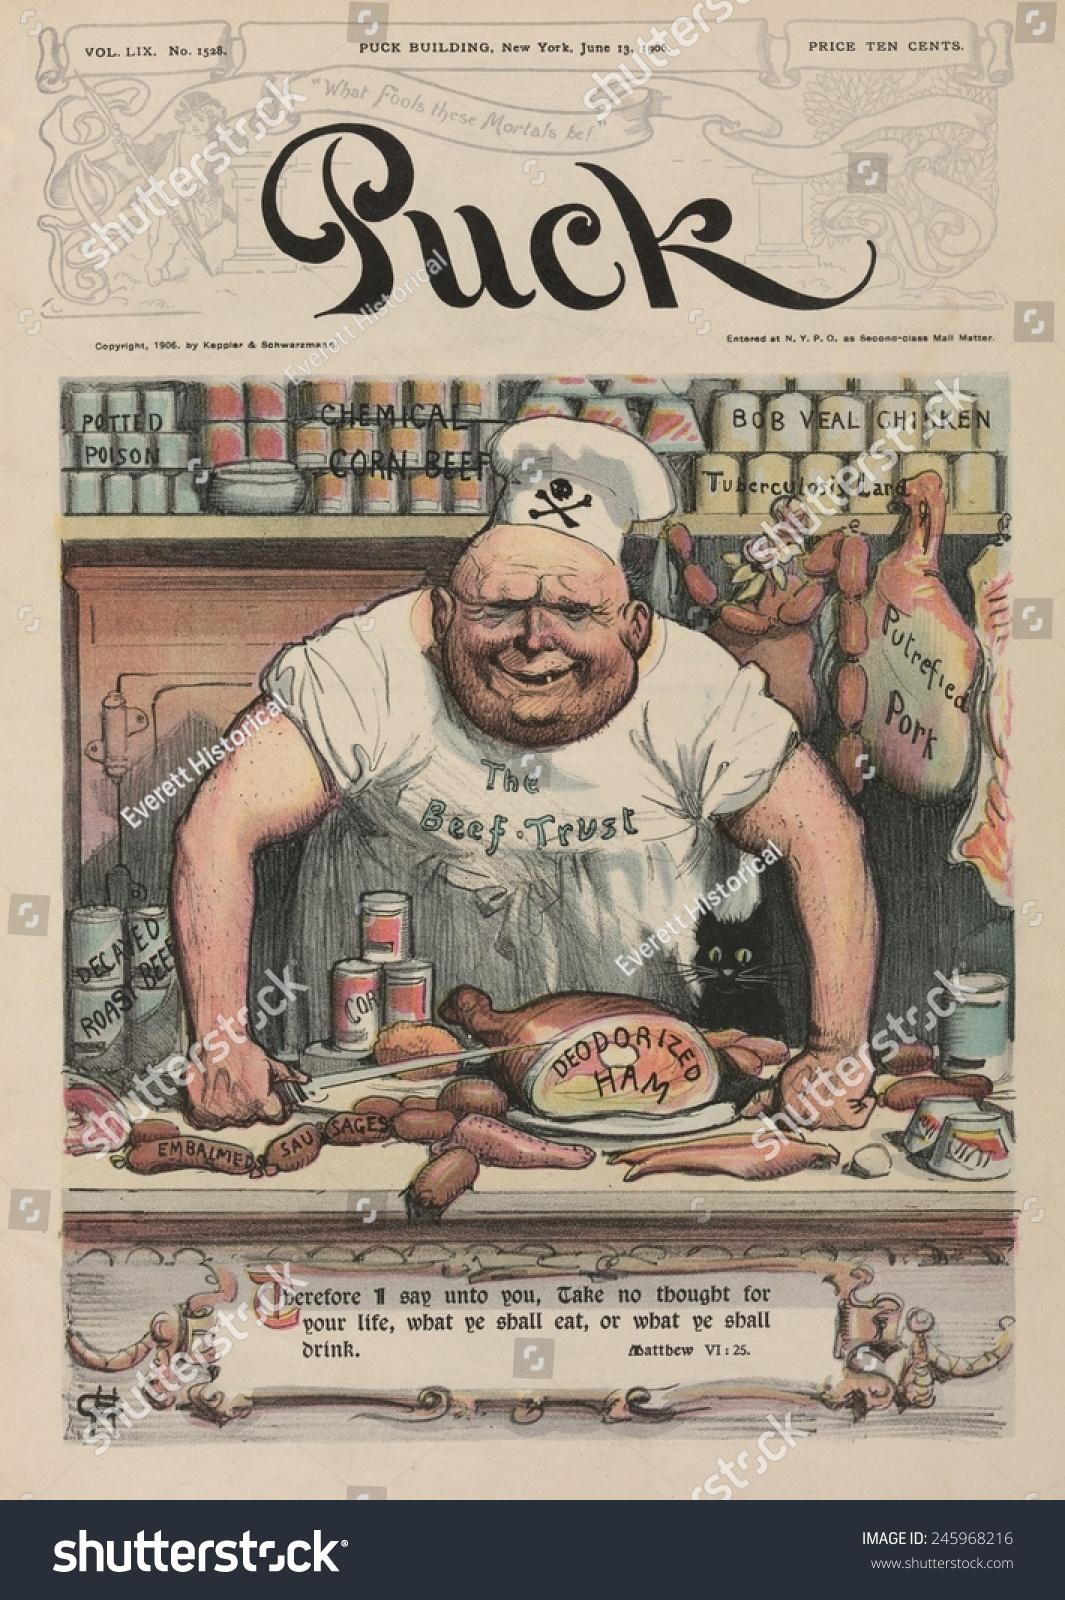 Meat market 1906 cartoon by carl stock illustration for Bob s fish market